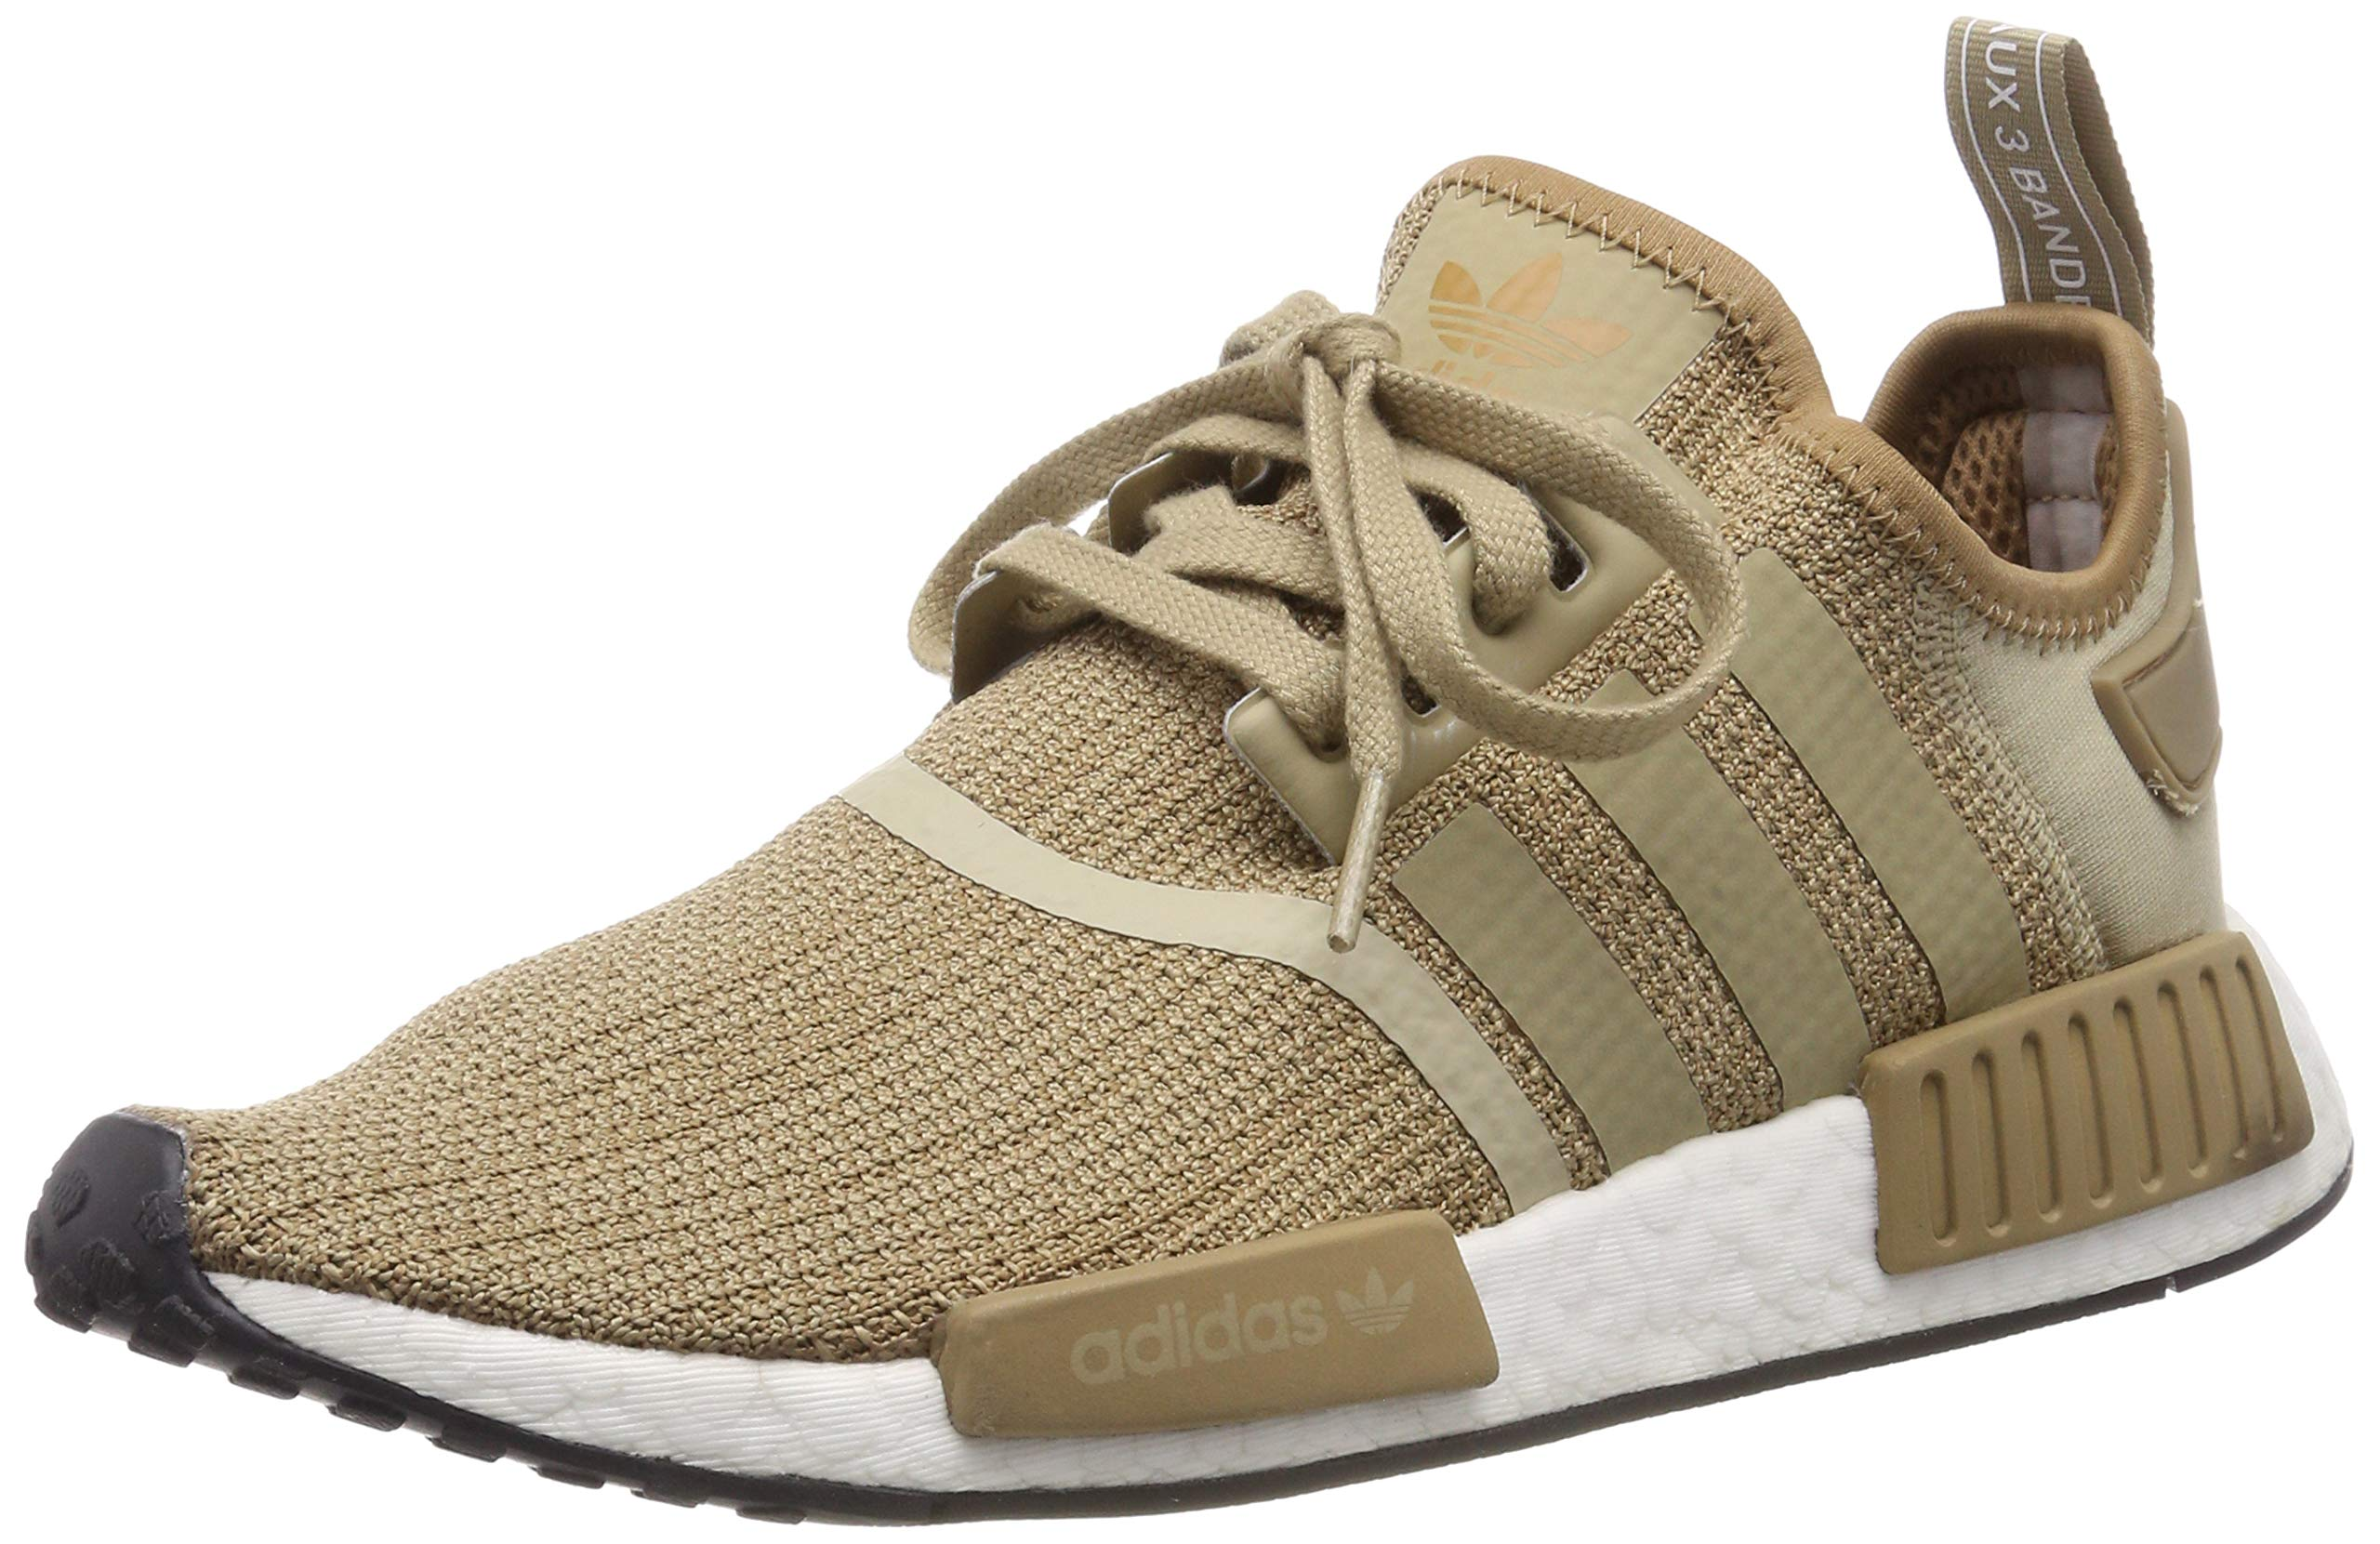 77990b825d060 adidas Originals NMD R1 Mens Running Trainers Sneakers (UK 8.5 US 9 EU 42 2